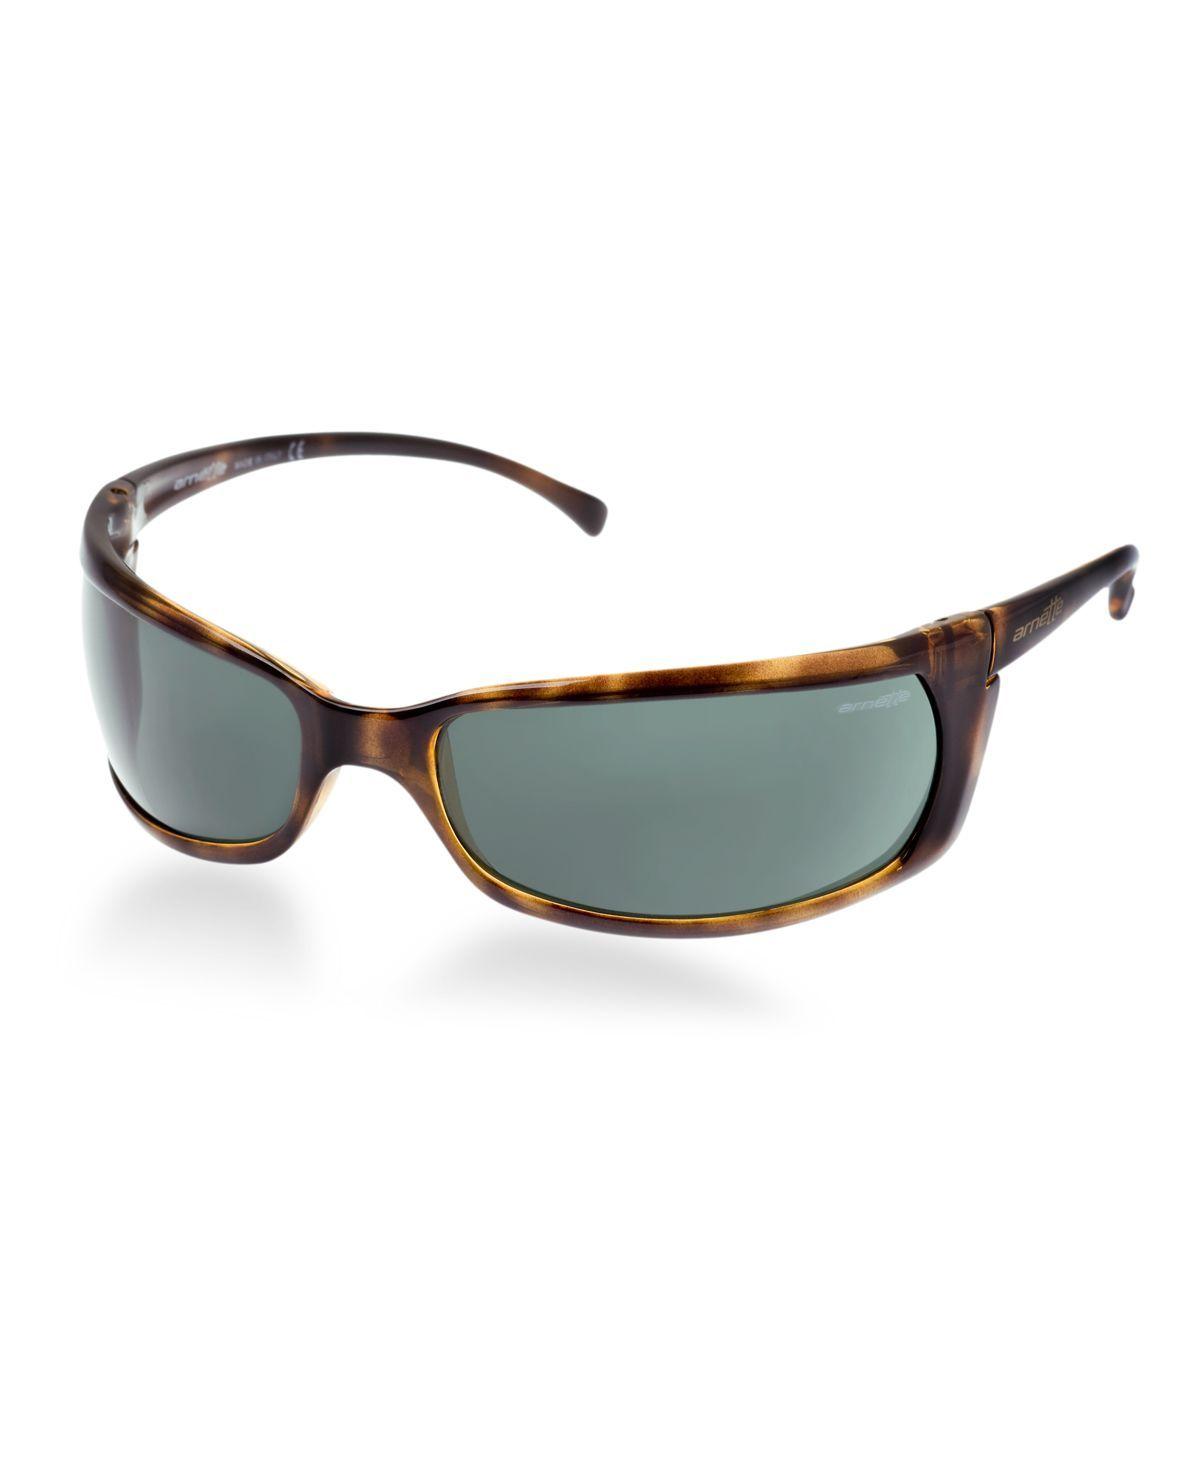 6f8aebb6fcb Arnette Sunglasses